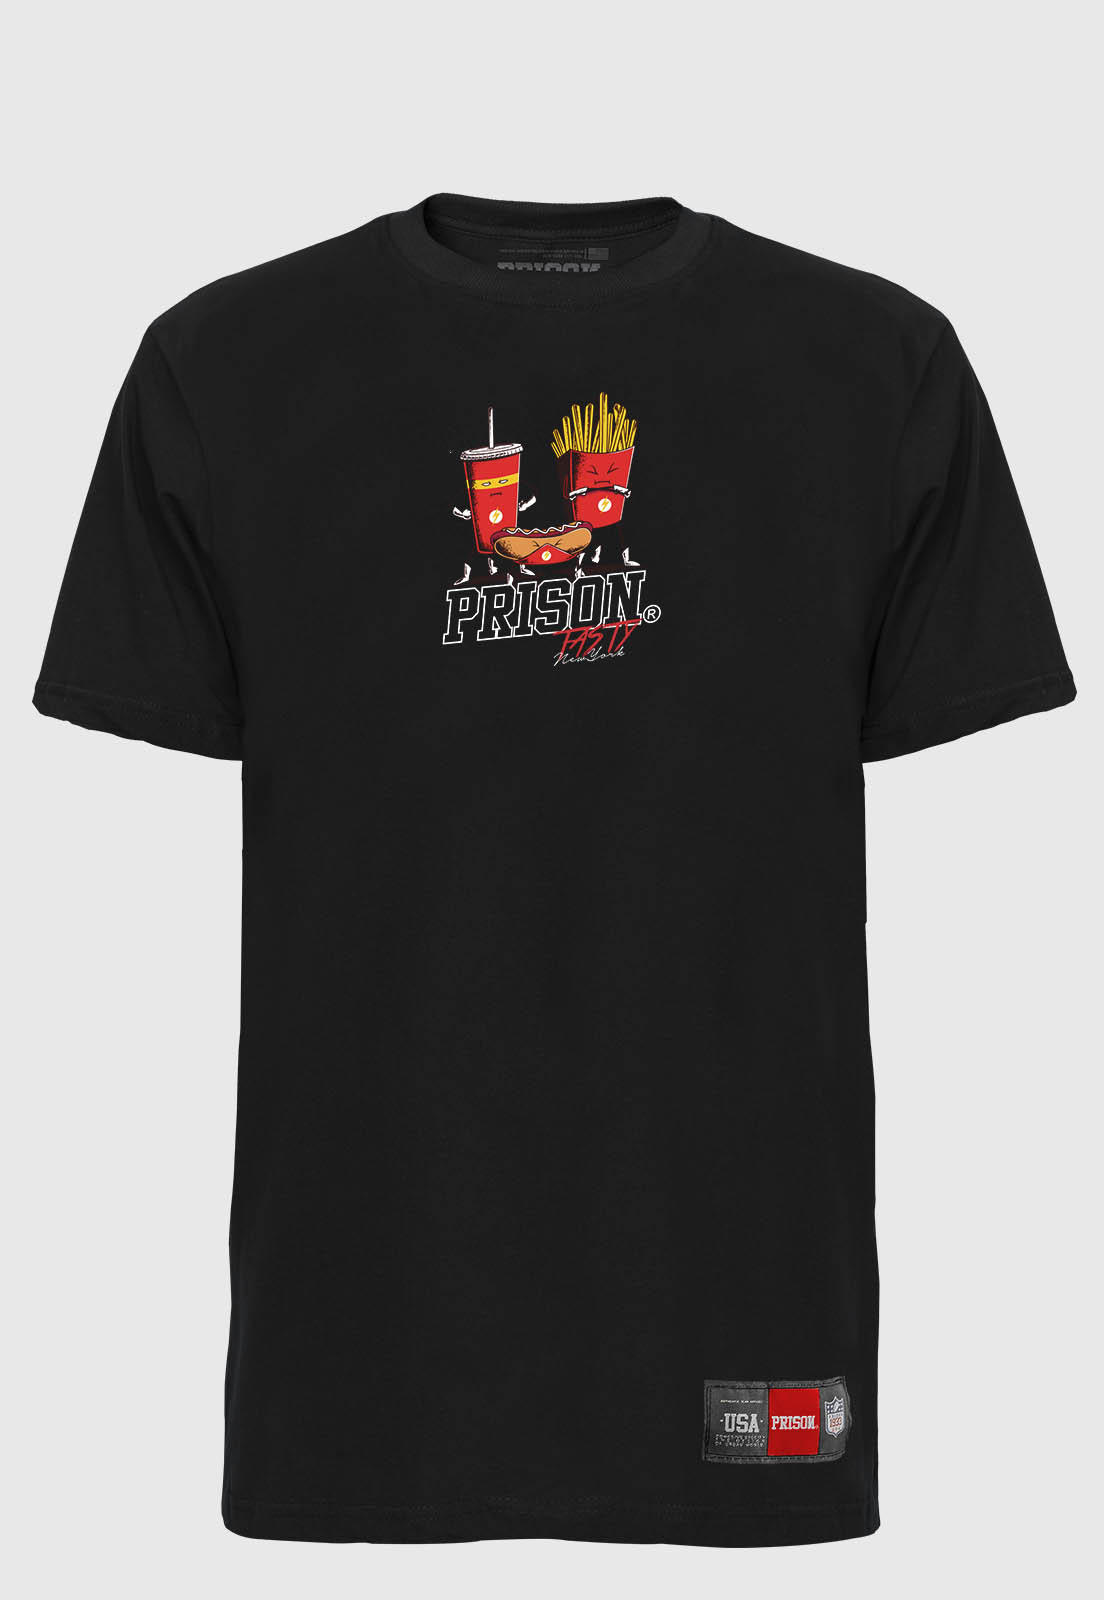 Camiseta Streetwear Prison Fasty New York